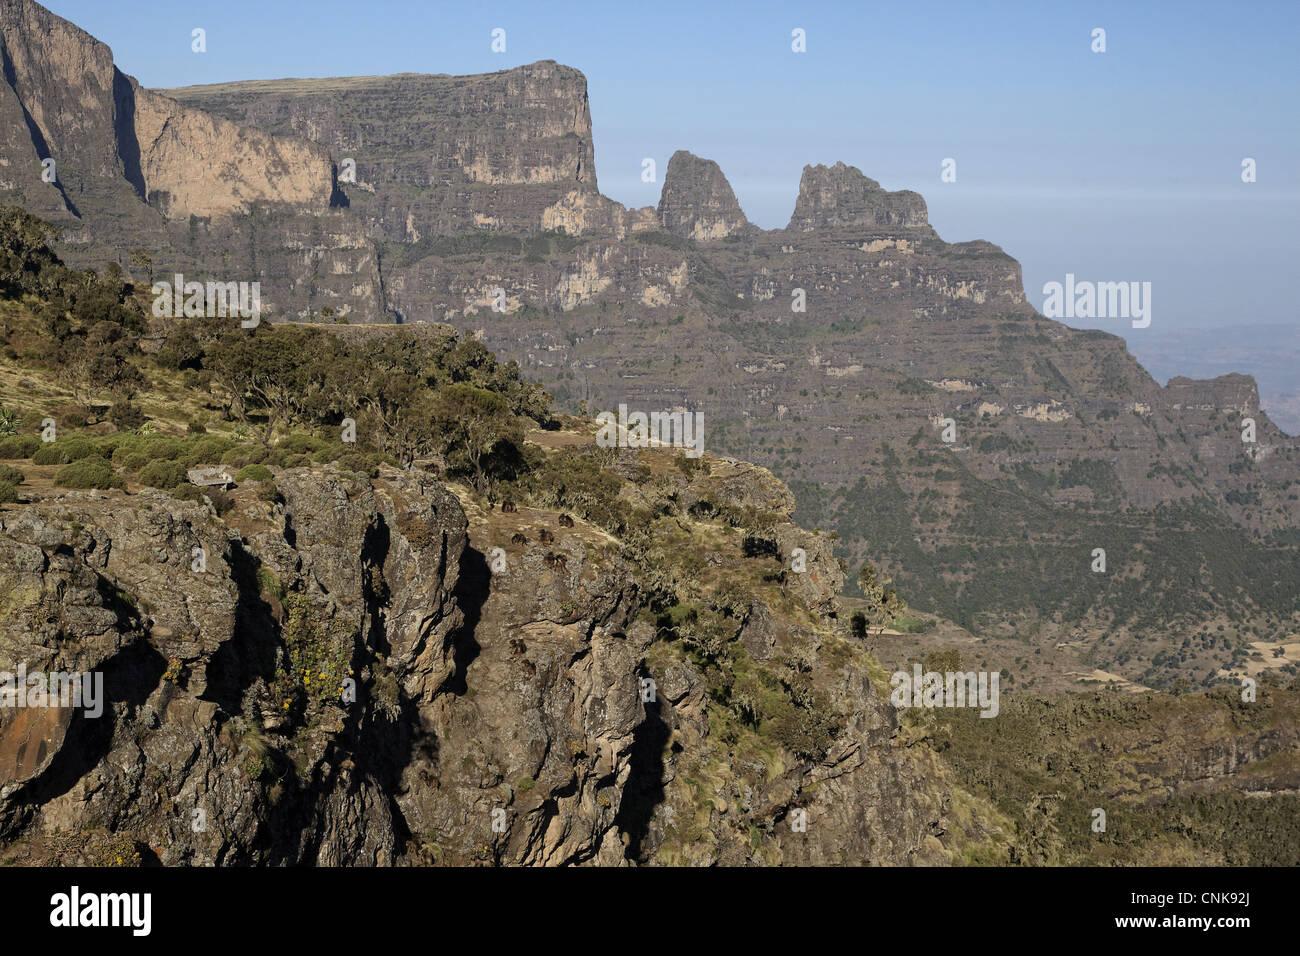 Gelada (Theropithecus gelada) troop, on cliff in mountain habitat, Simien Mountains, Ethiopia - Stock Image